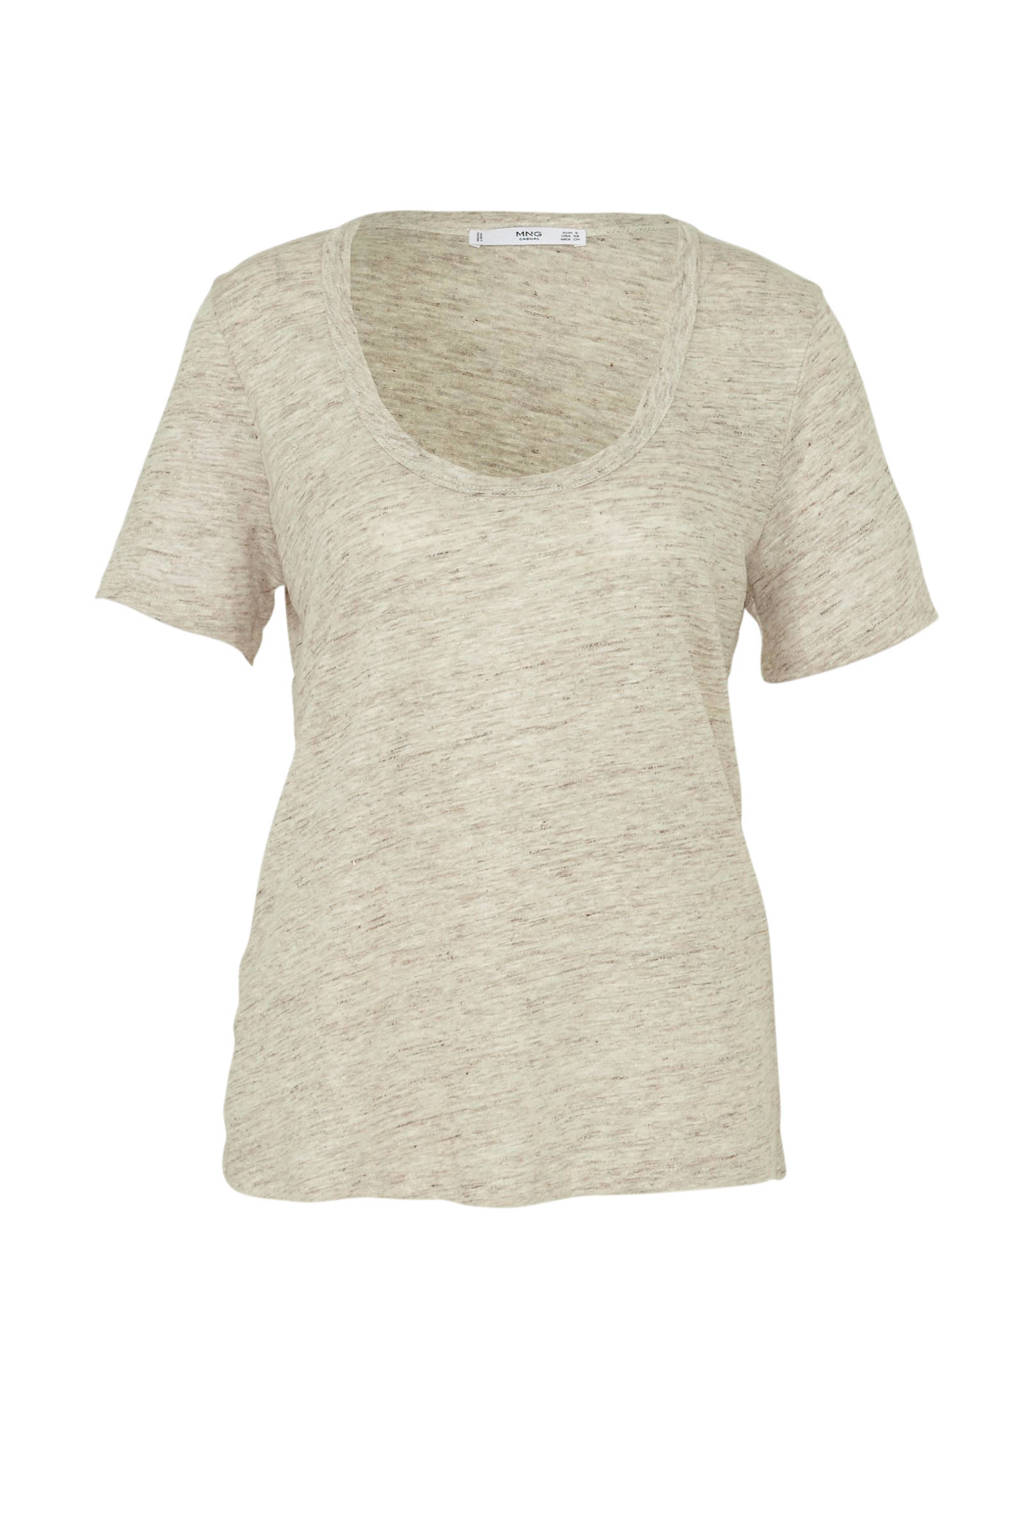 Mango linnen T-shirt beige, Beige